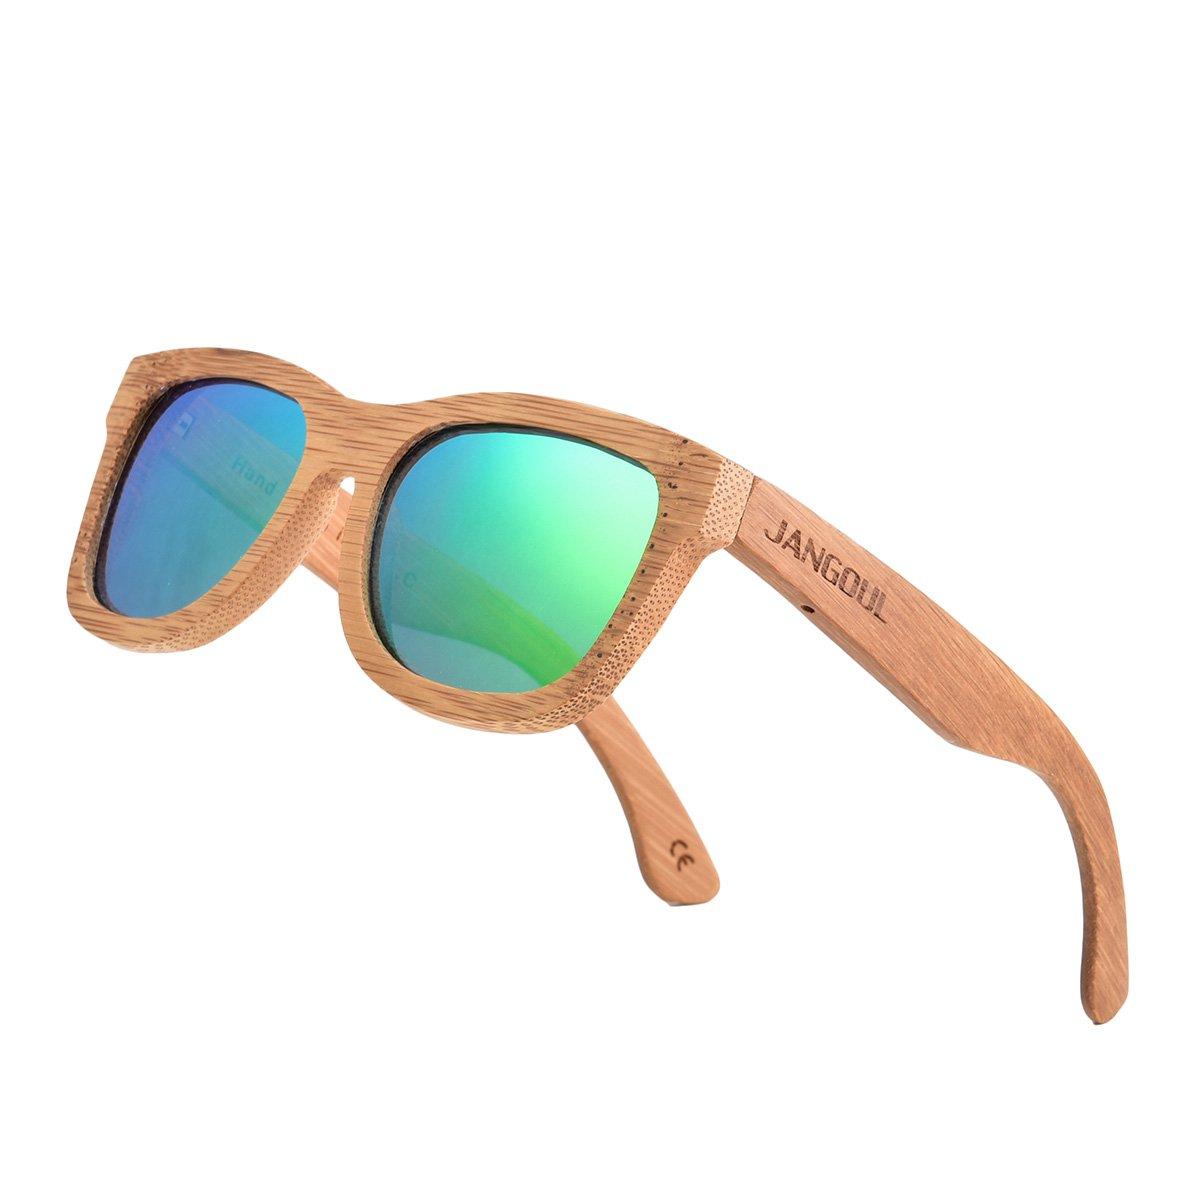 JANGOUL Polarized Sunglasses Carbonized Bamboo Frame For Men Women with Gift Box (Carbonized Bamboo Frame, Green)